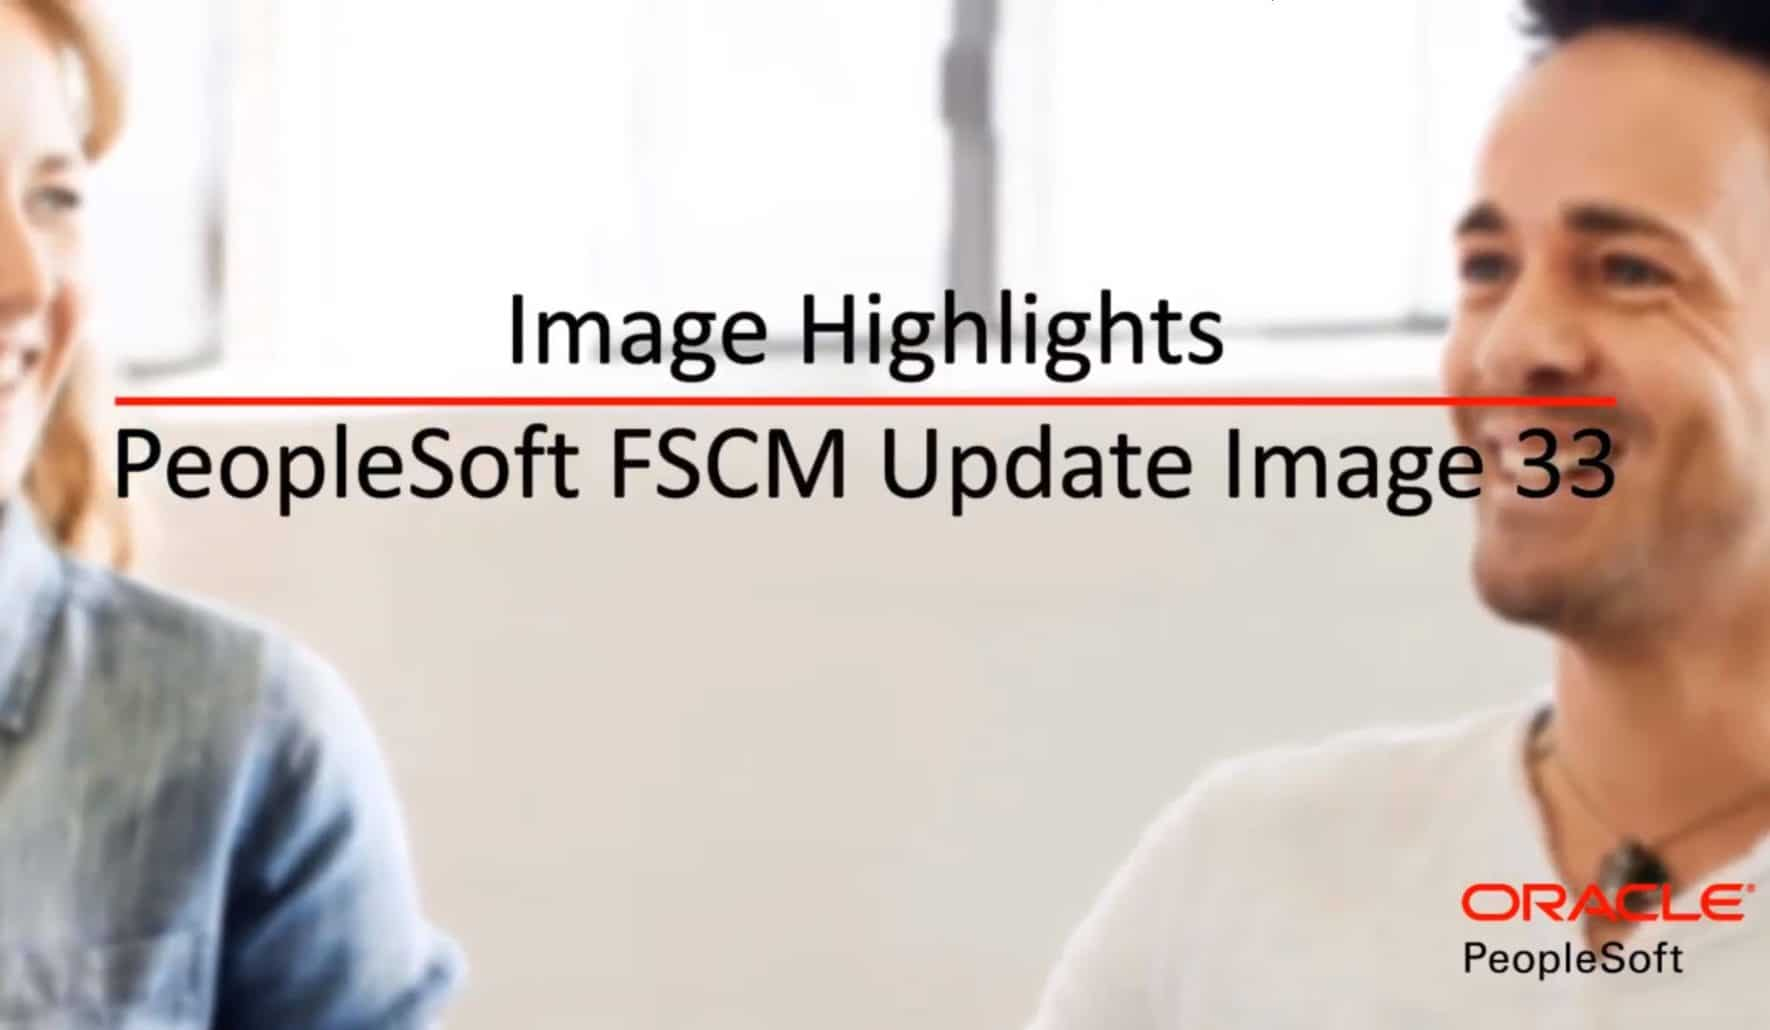 FSCM-Update-Image-33